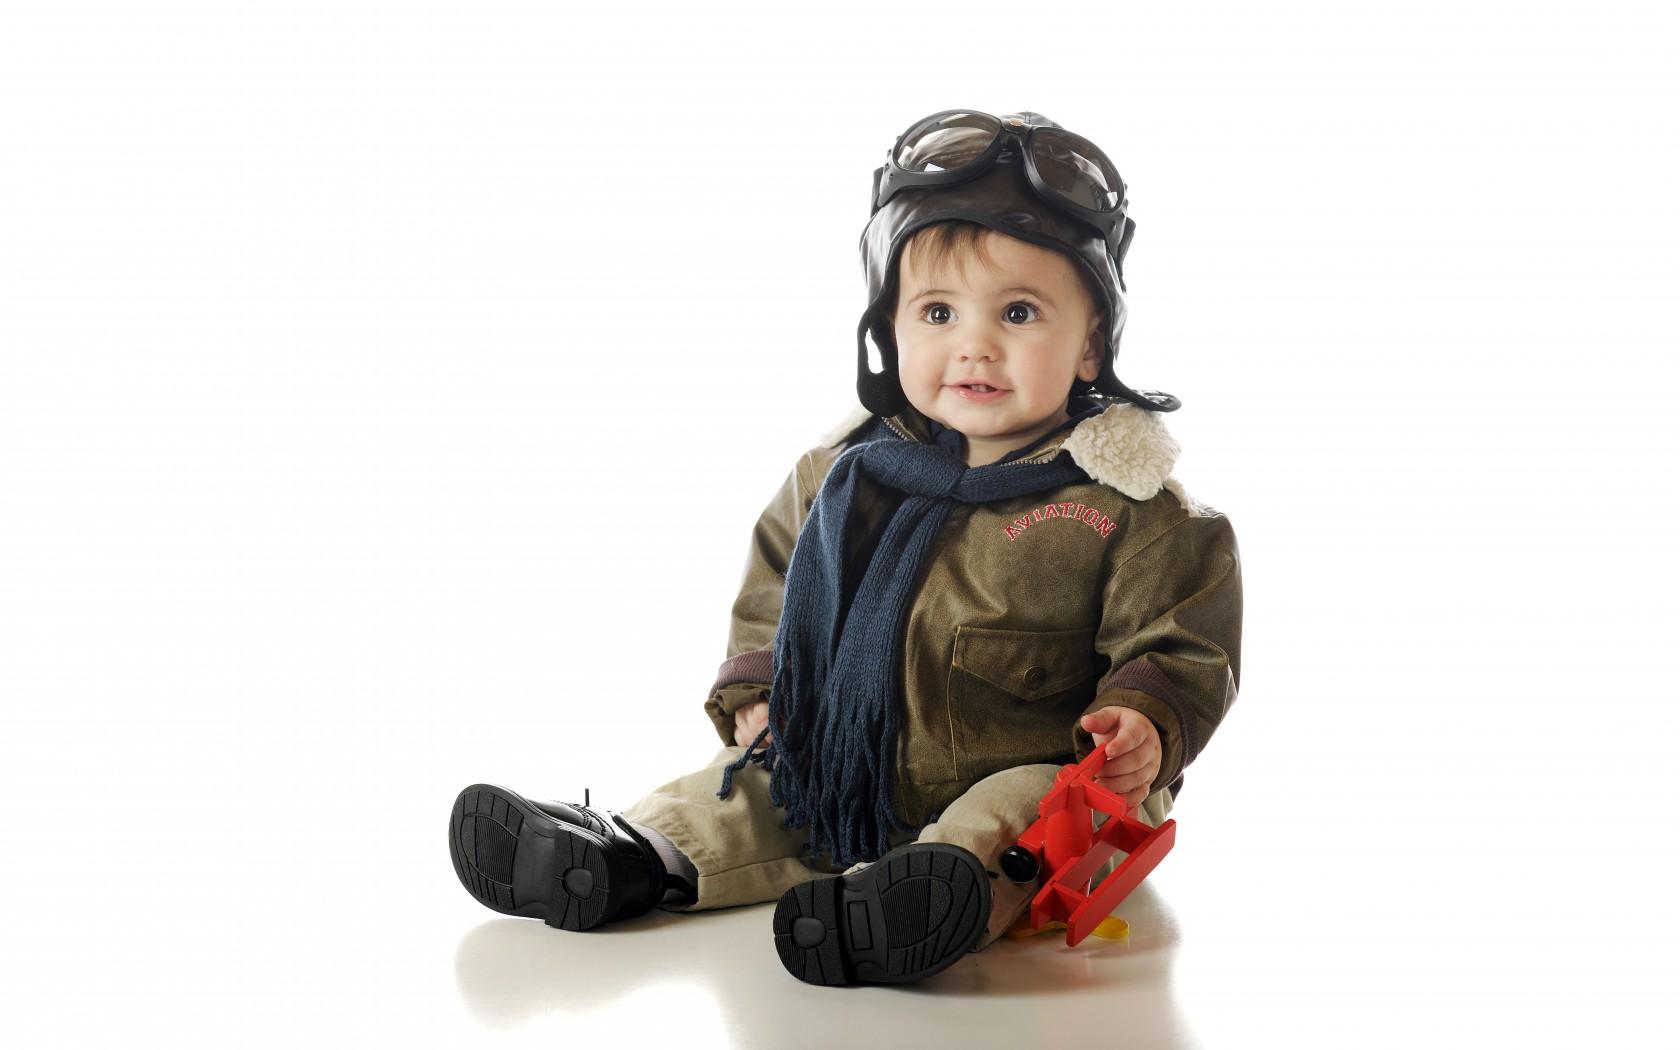 Авиабилеты для детей Детские тарифы на билеты Aviakassaby